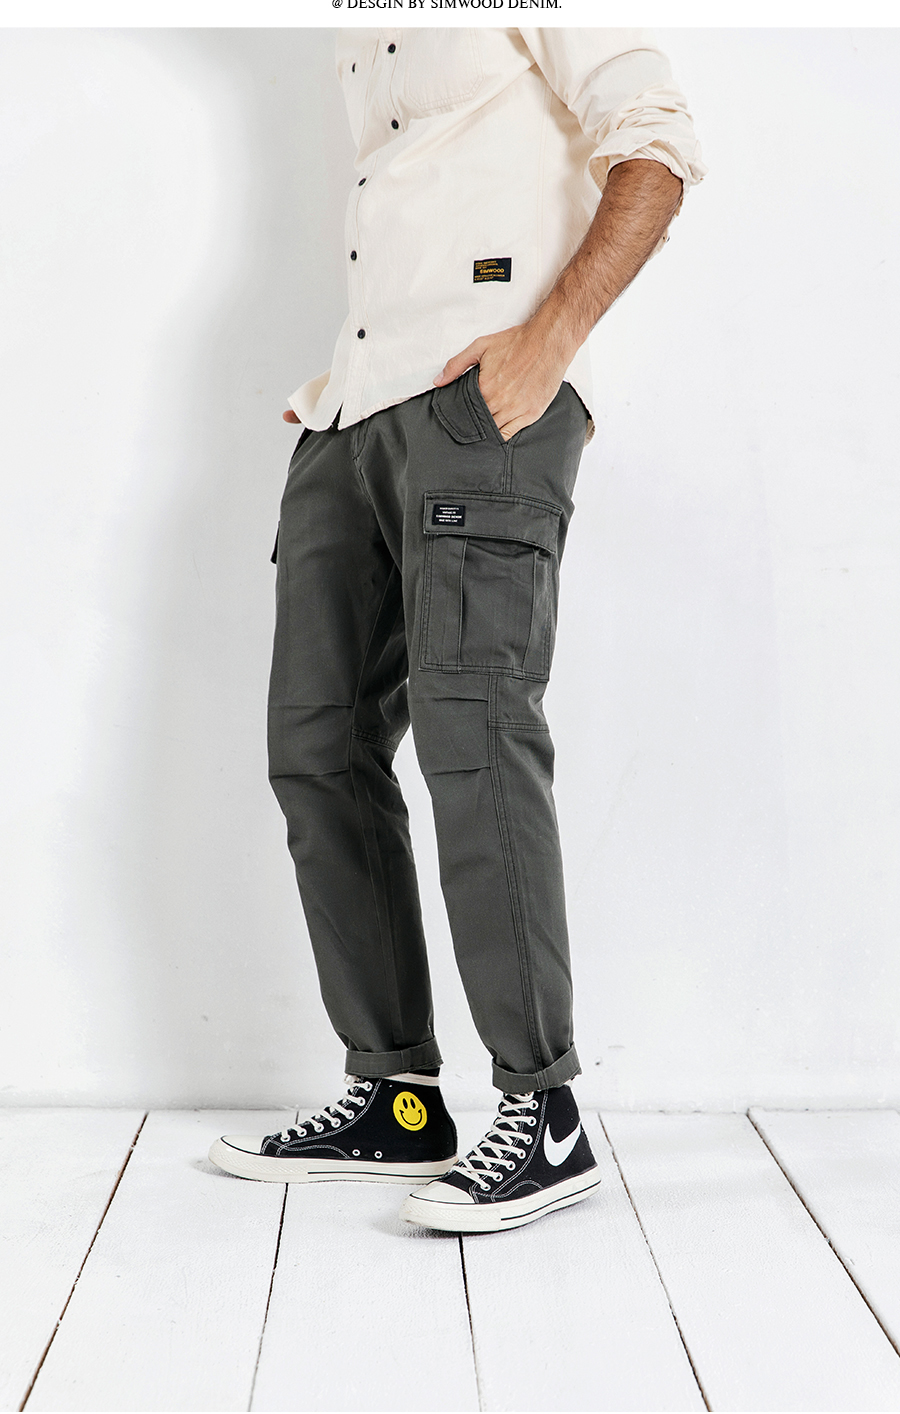 Hafd9929c68b24e0c975997726d4330f6l SIMWOOD New 2019 Casual Pants Men Fashion track Cargo Pants Ankle-Length military autumn Trousers Men pantalon hombre 180614